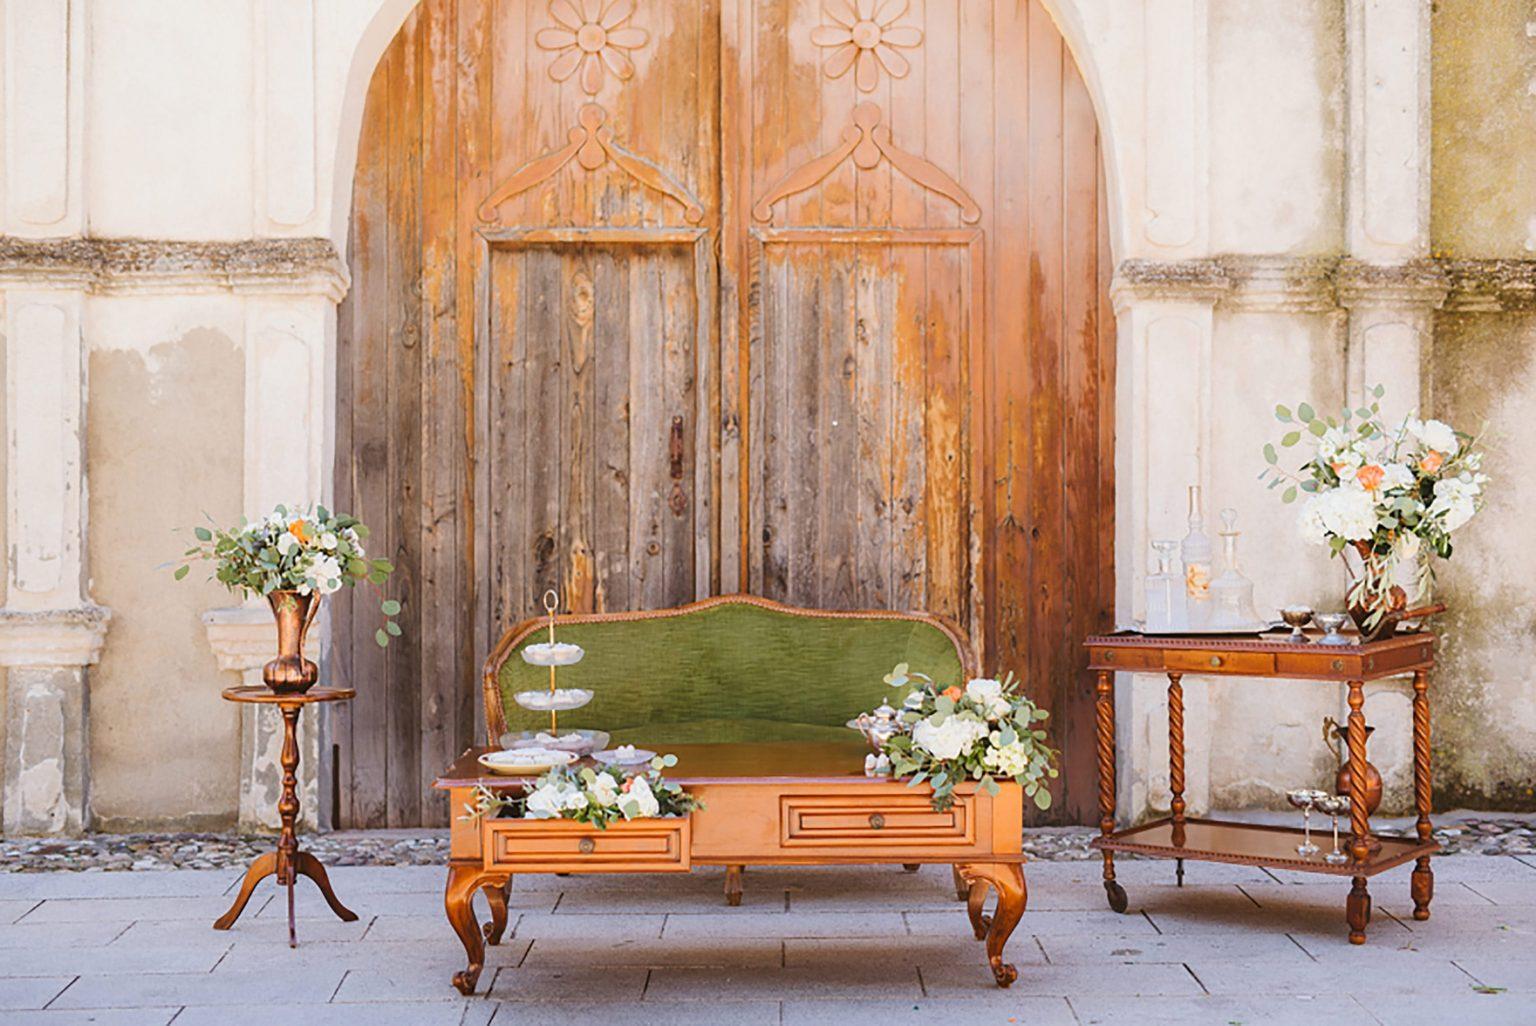 Italian village elopement, vintage furniture